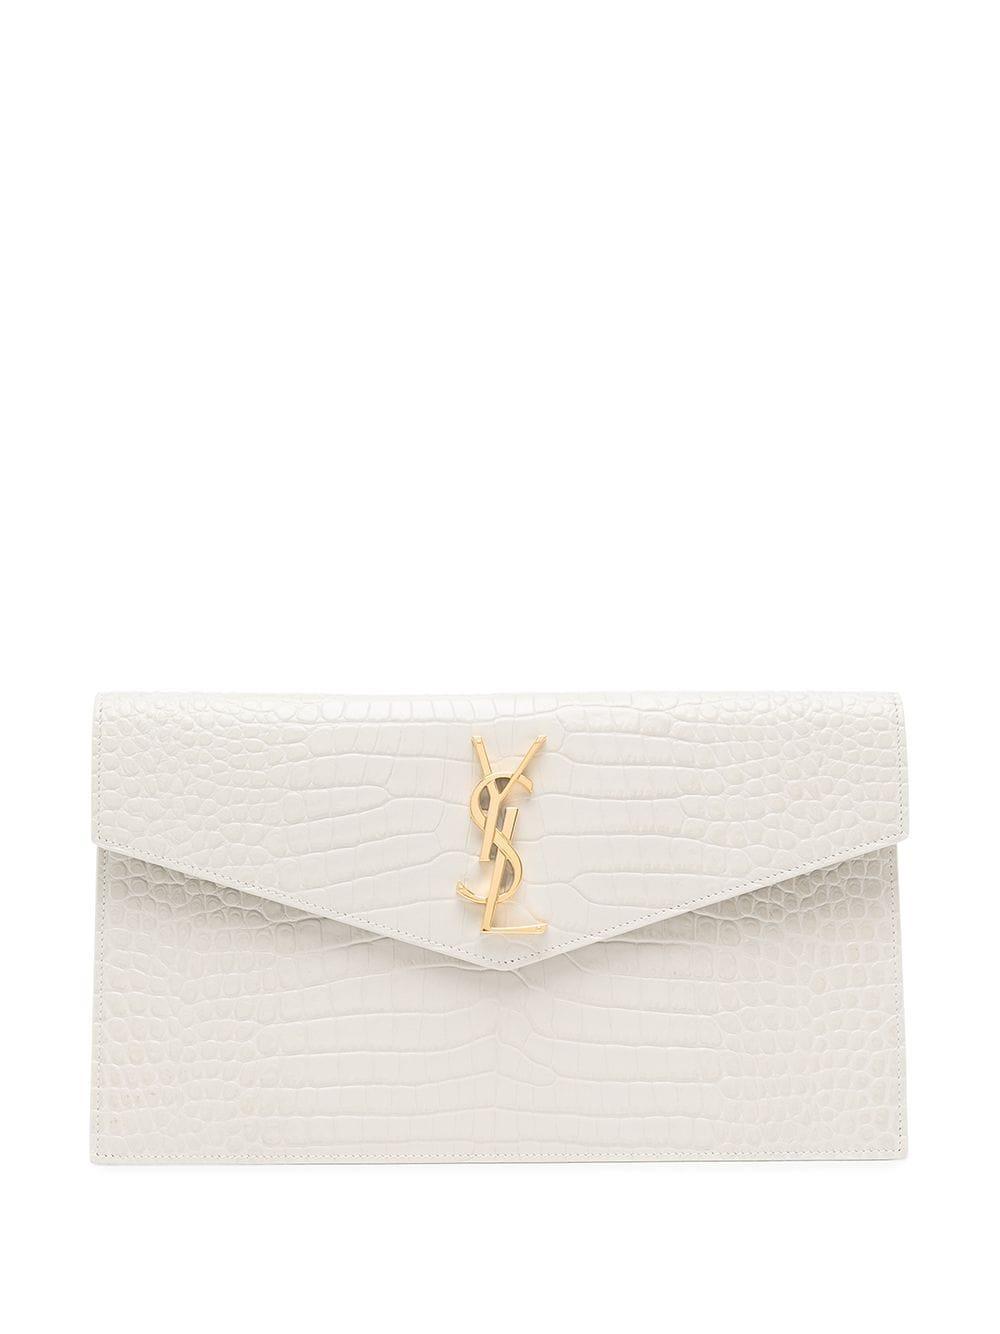 Medium Croc-Embossed Envelope Pouch